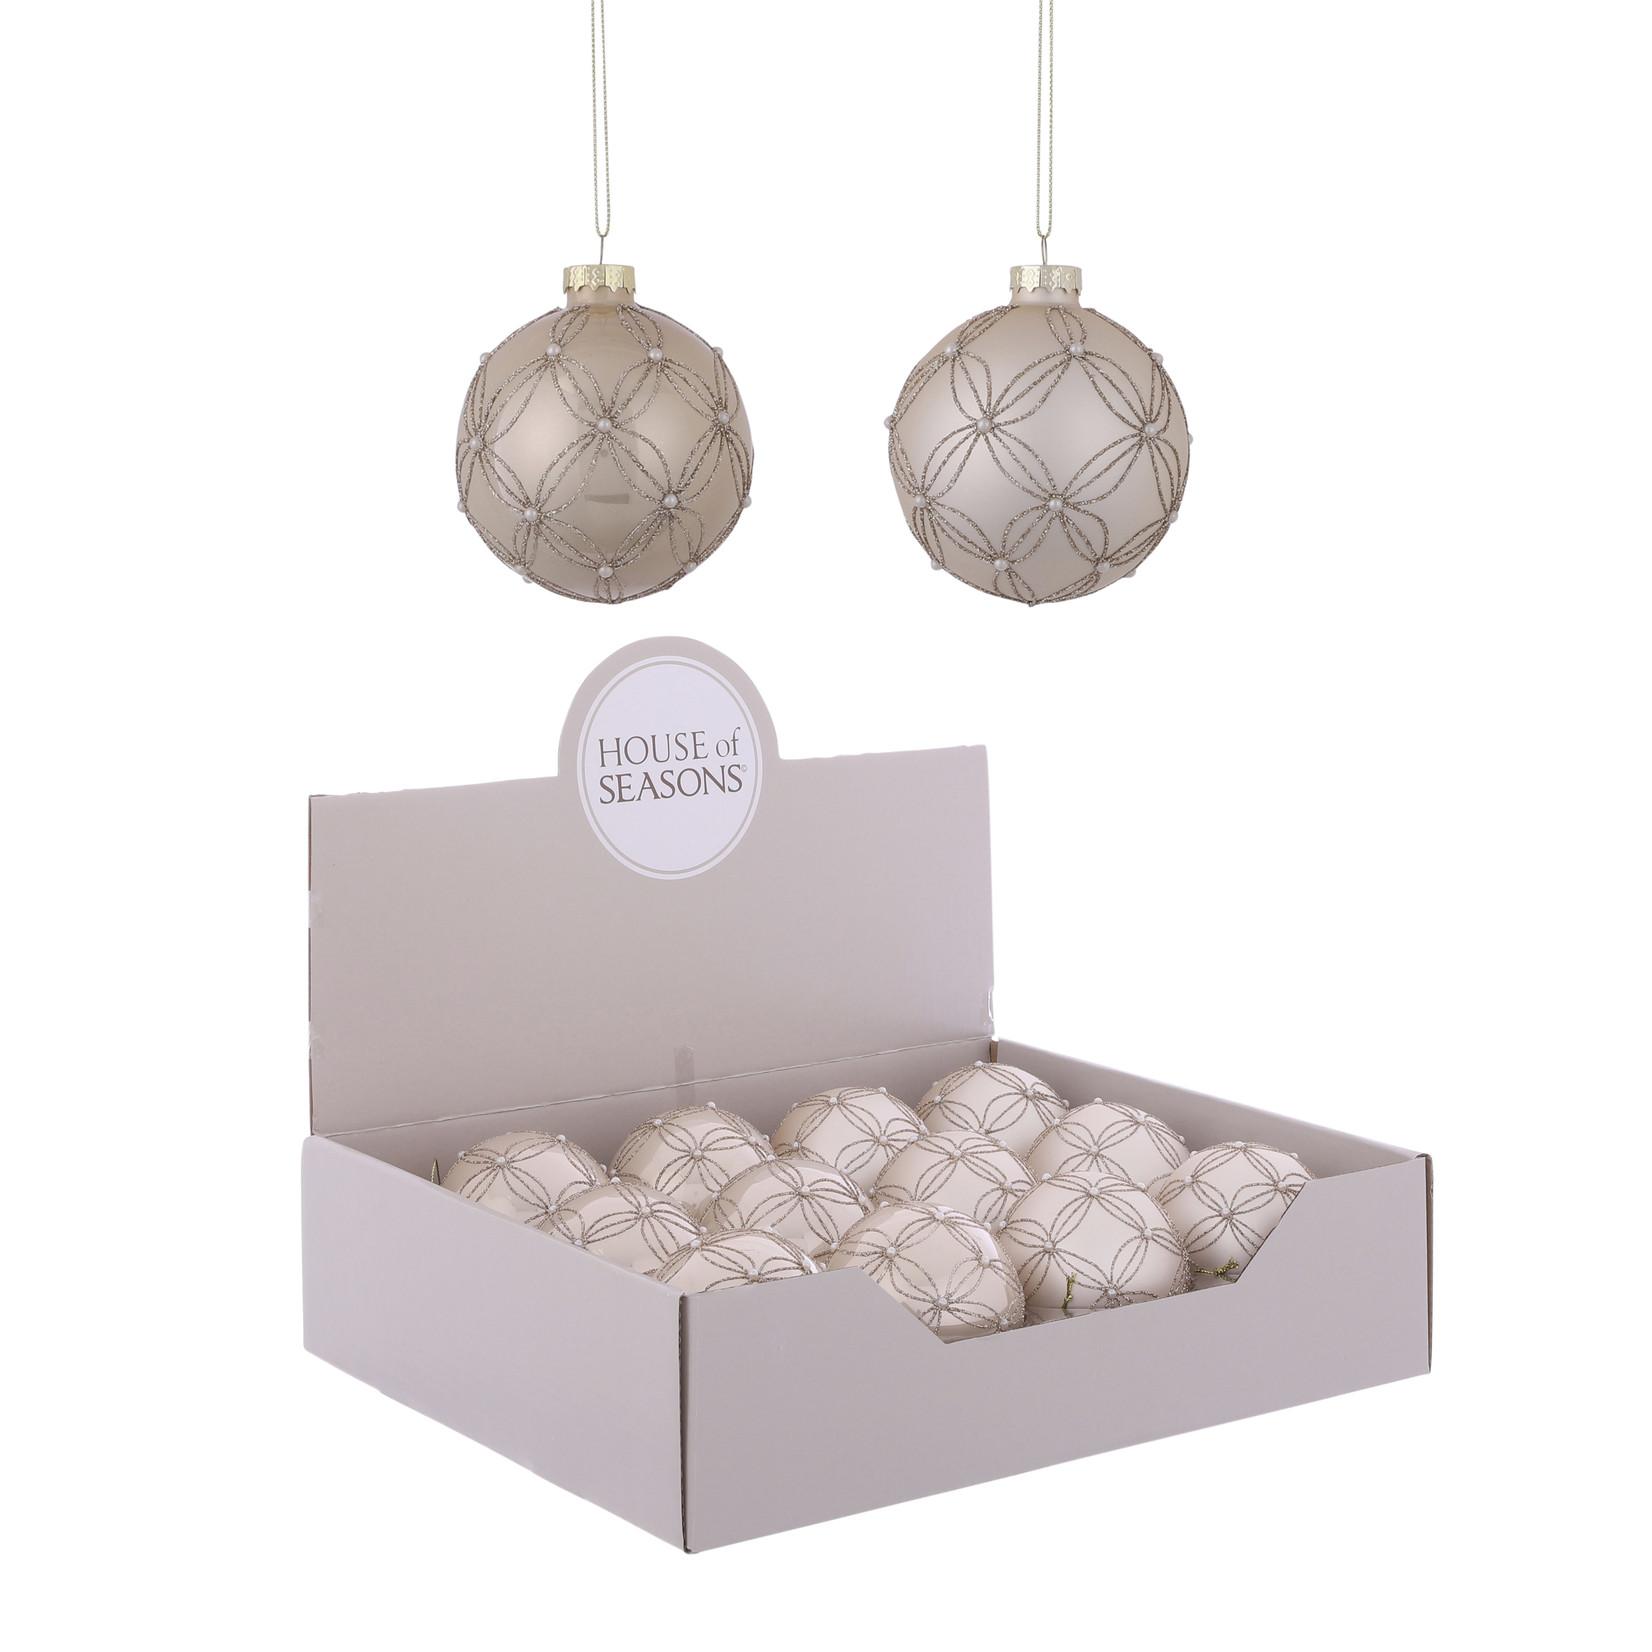 House of Seasons Ornament bal creme 2 assorti